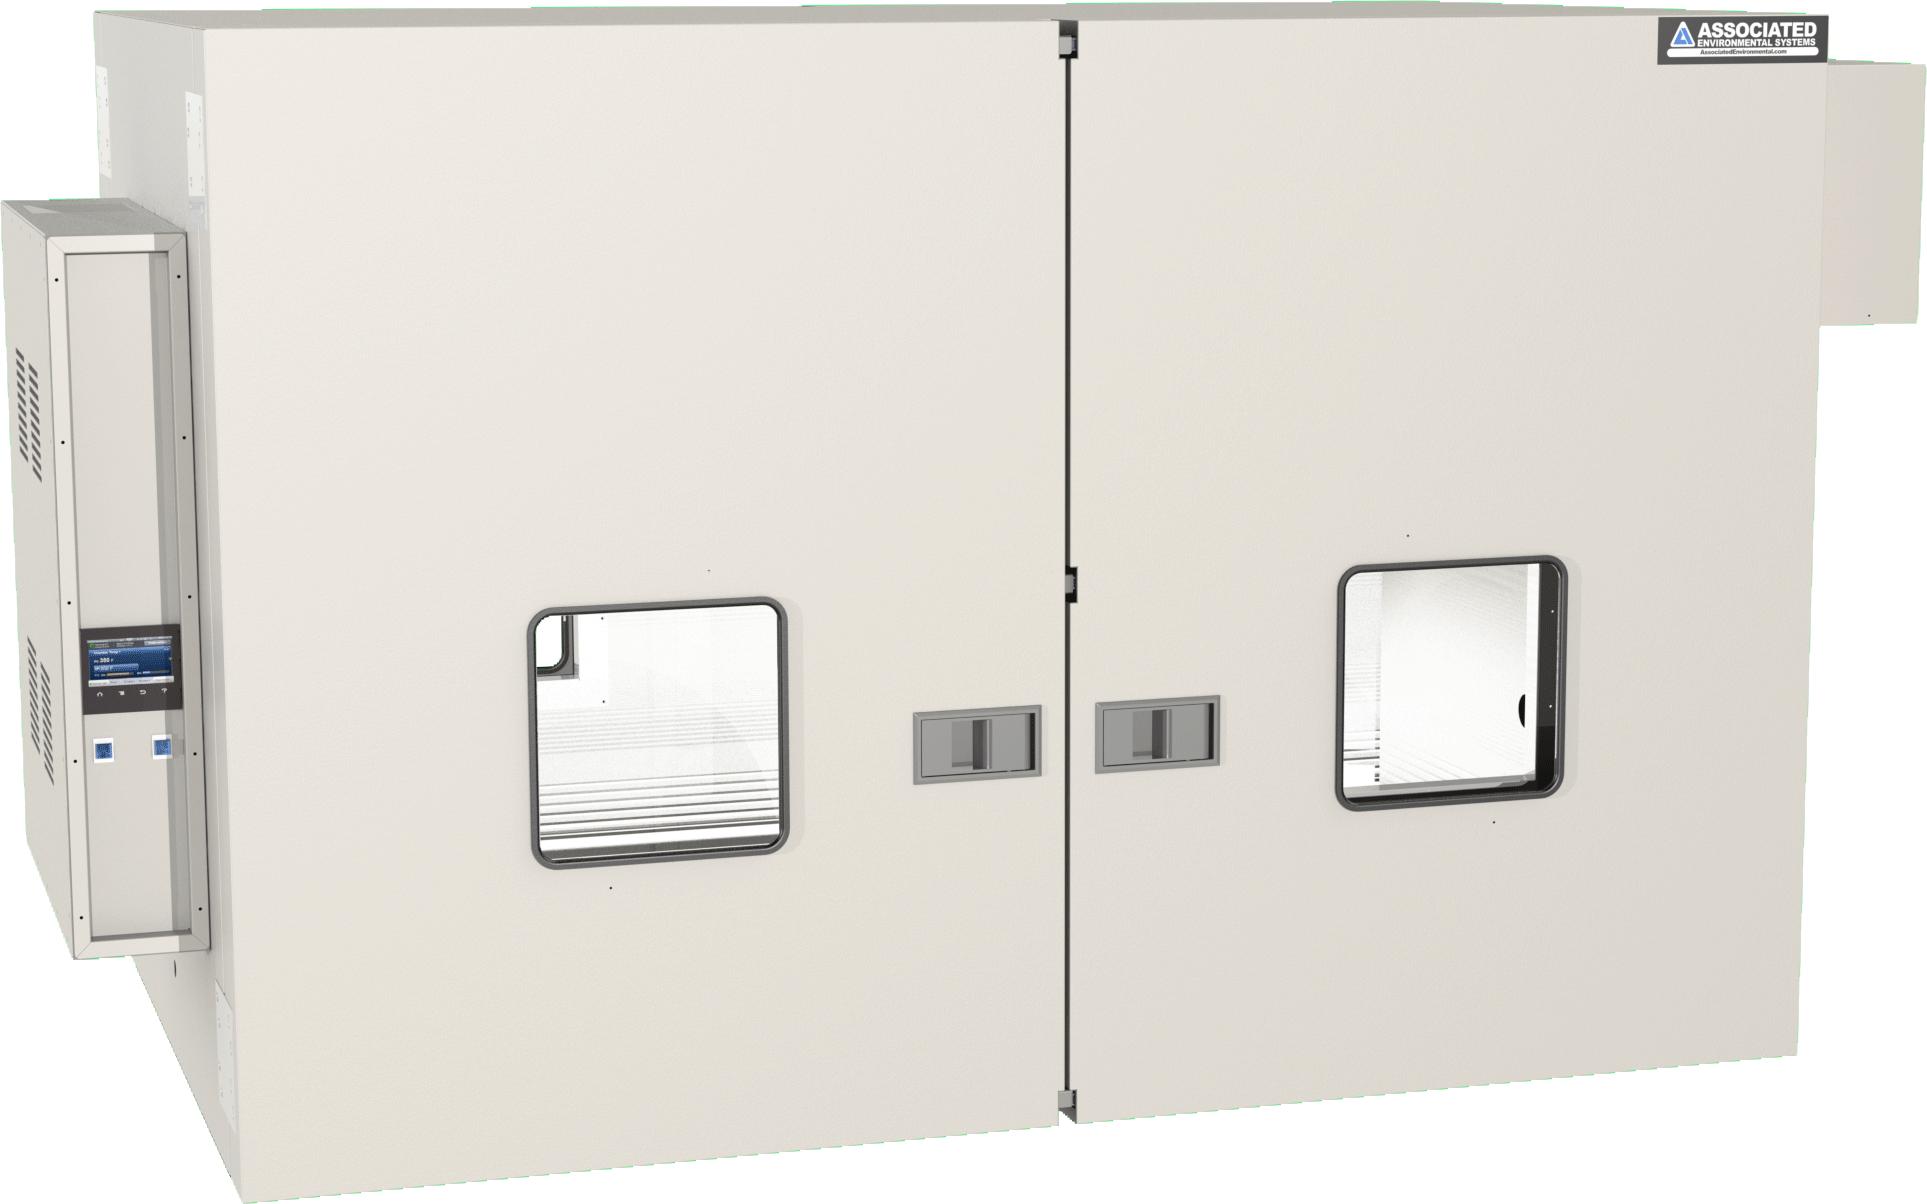 Lab oven with bi-parting doors